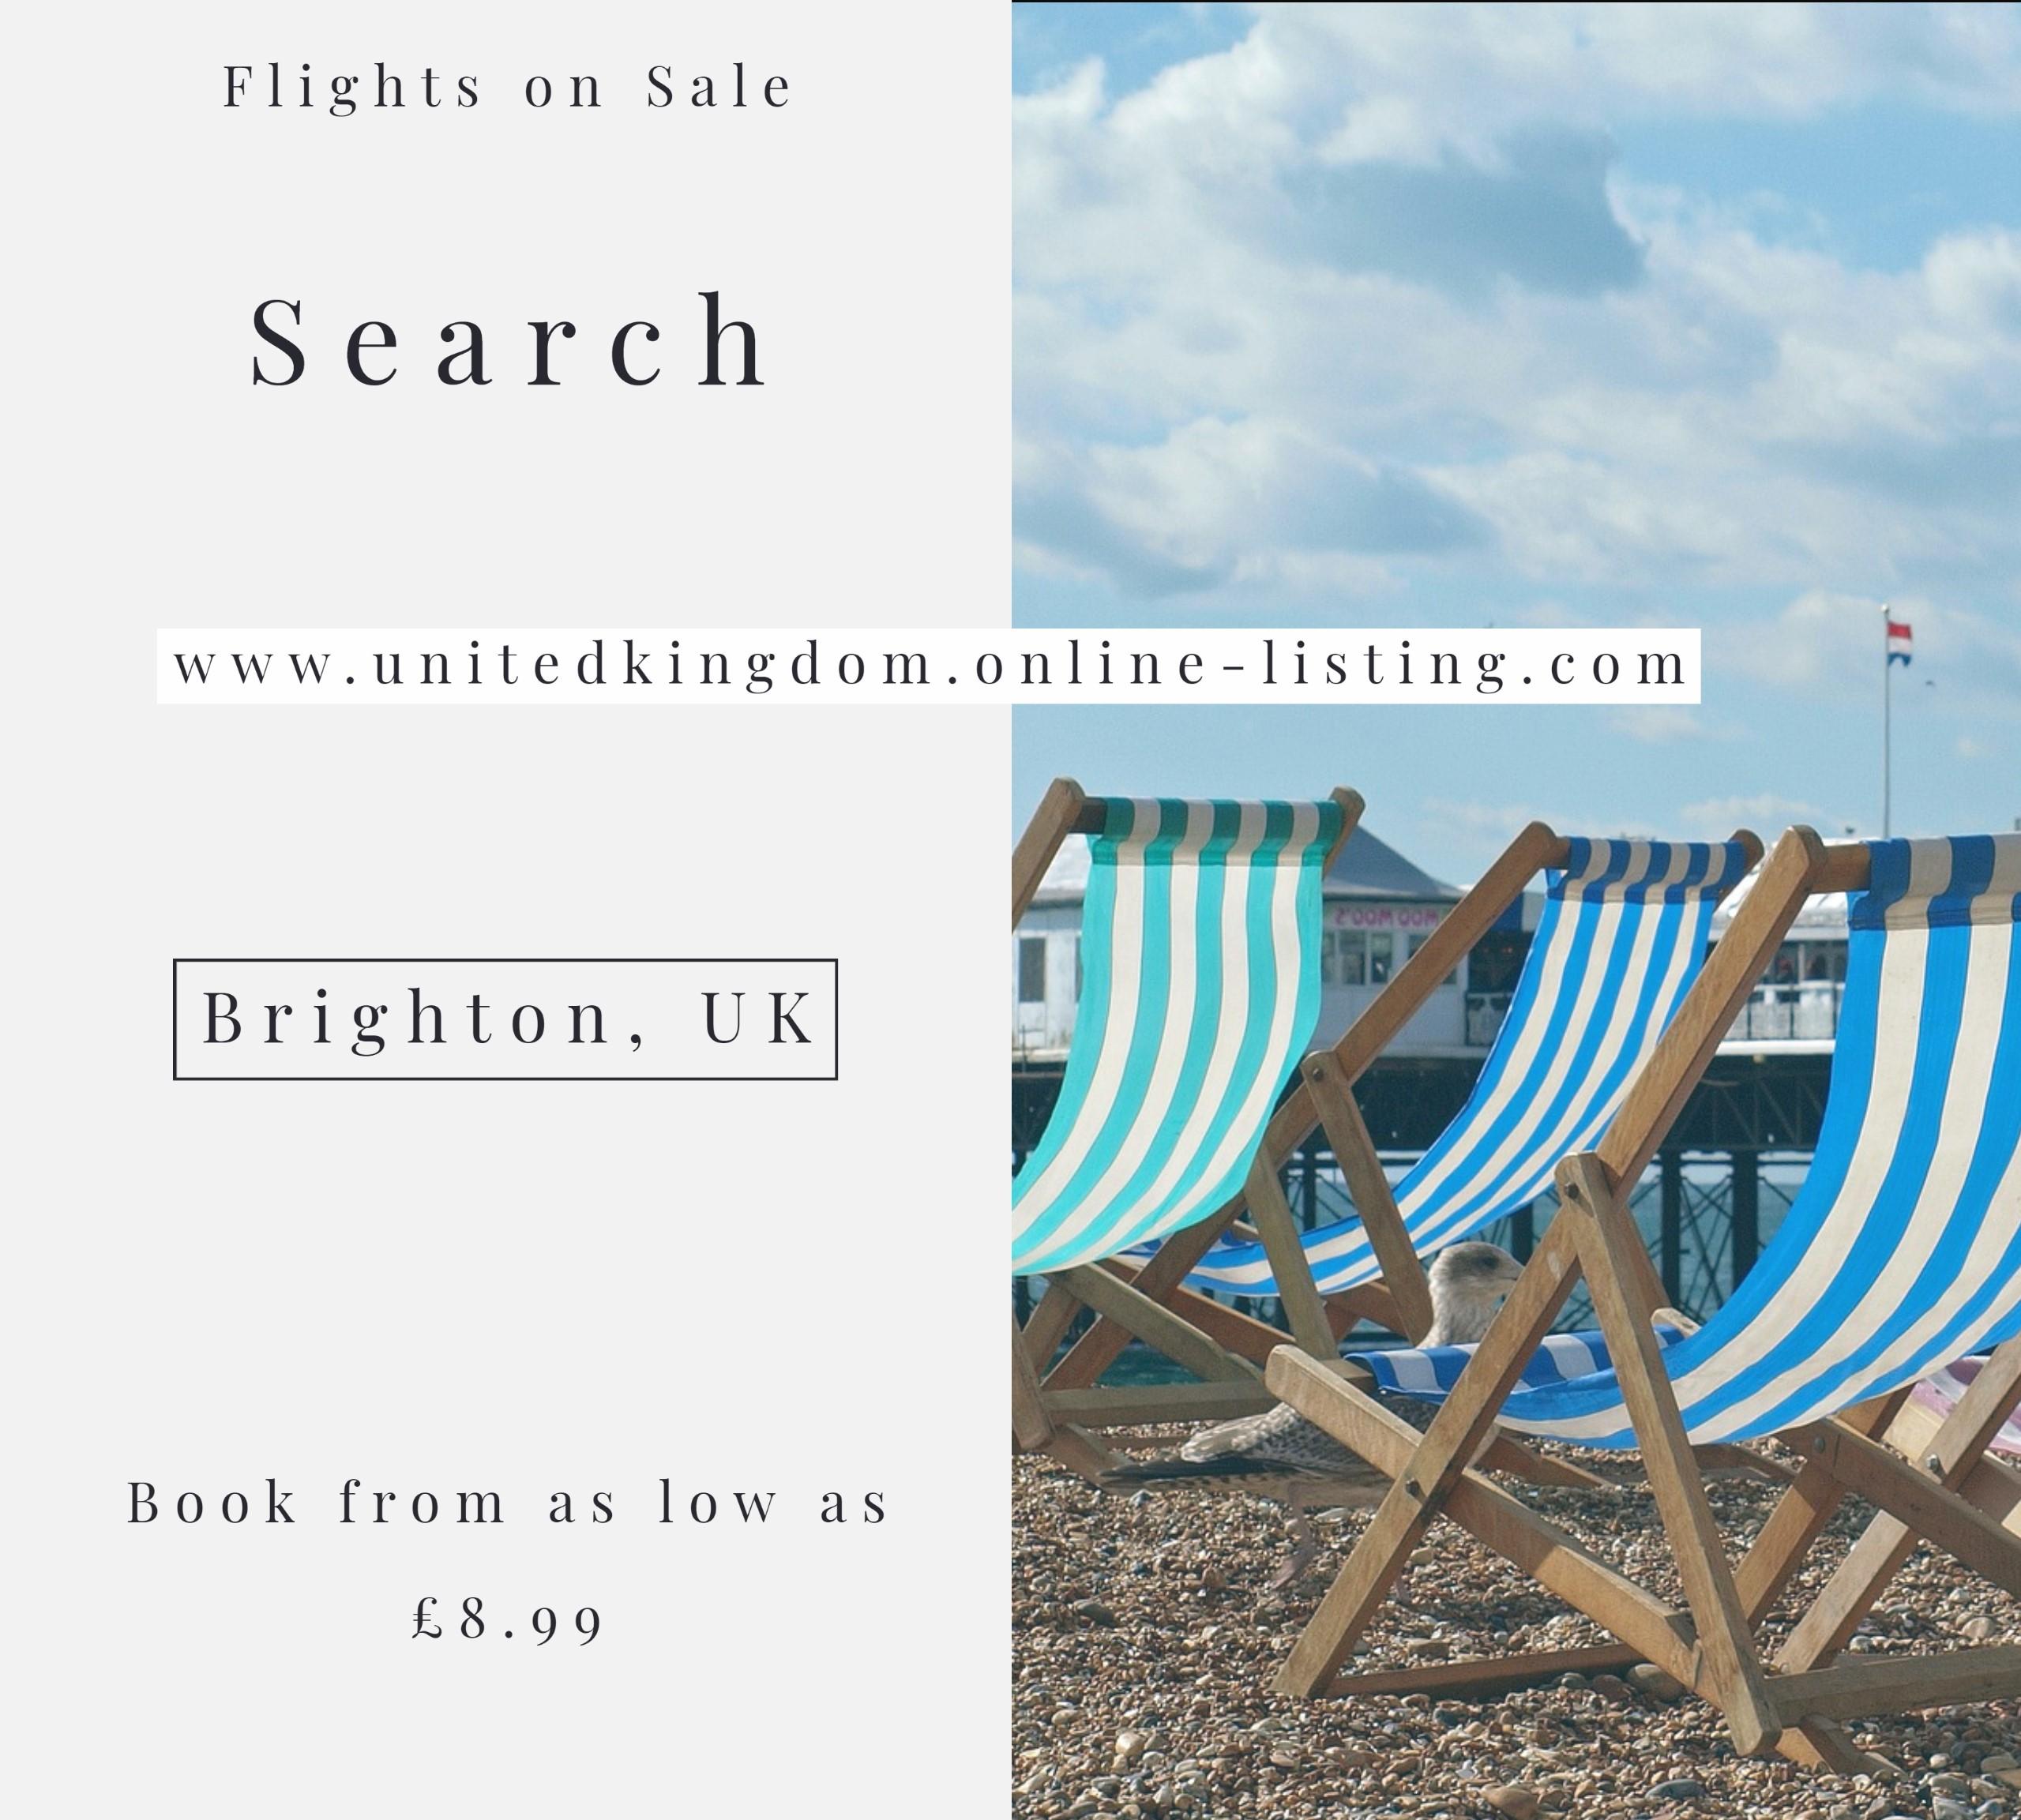 UK Brighton Flightd